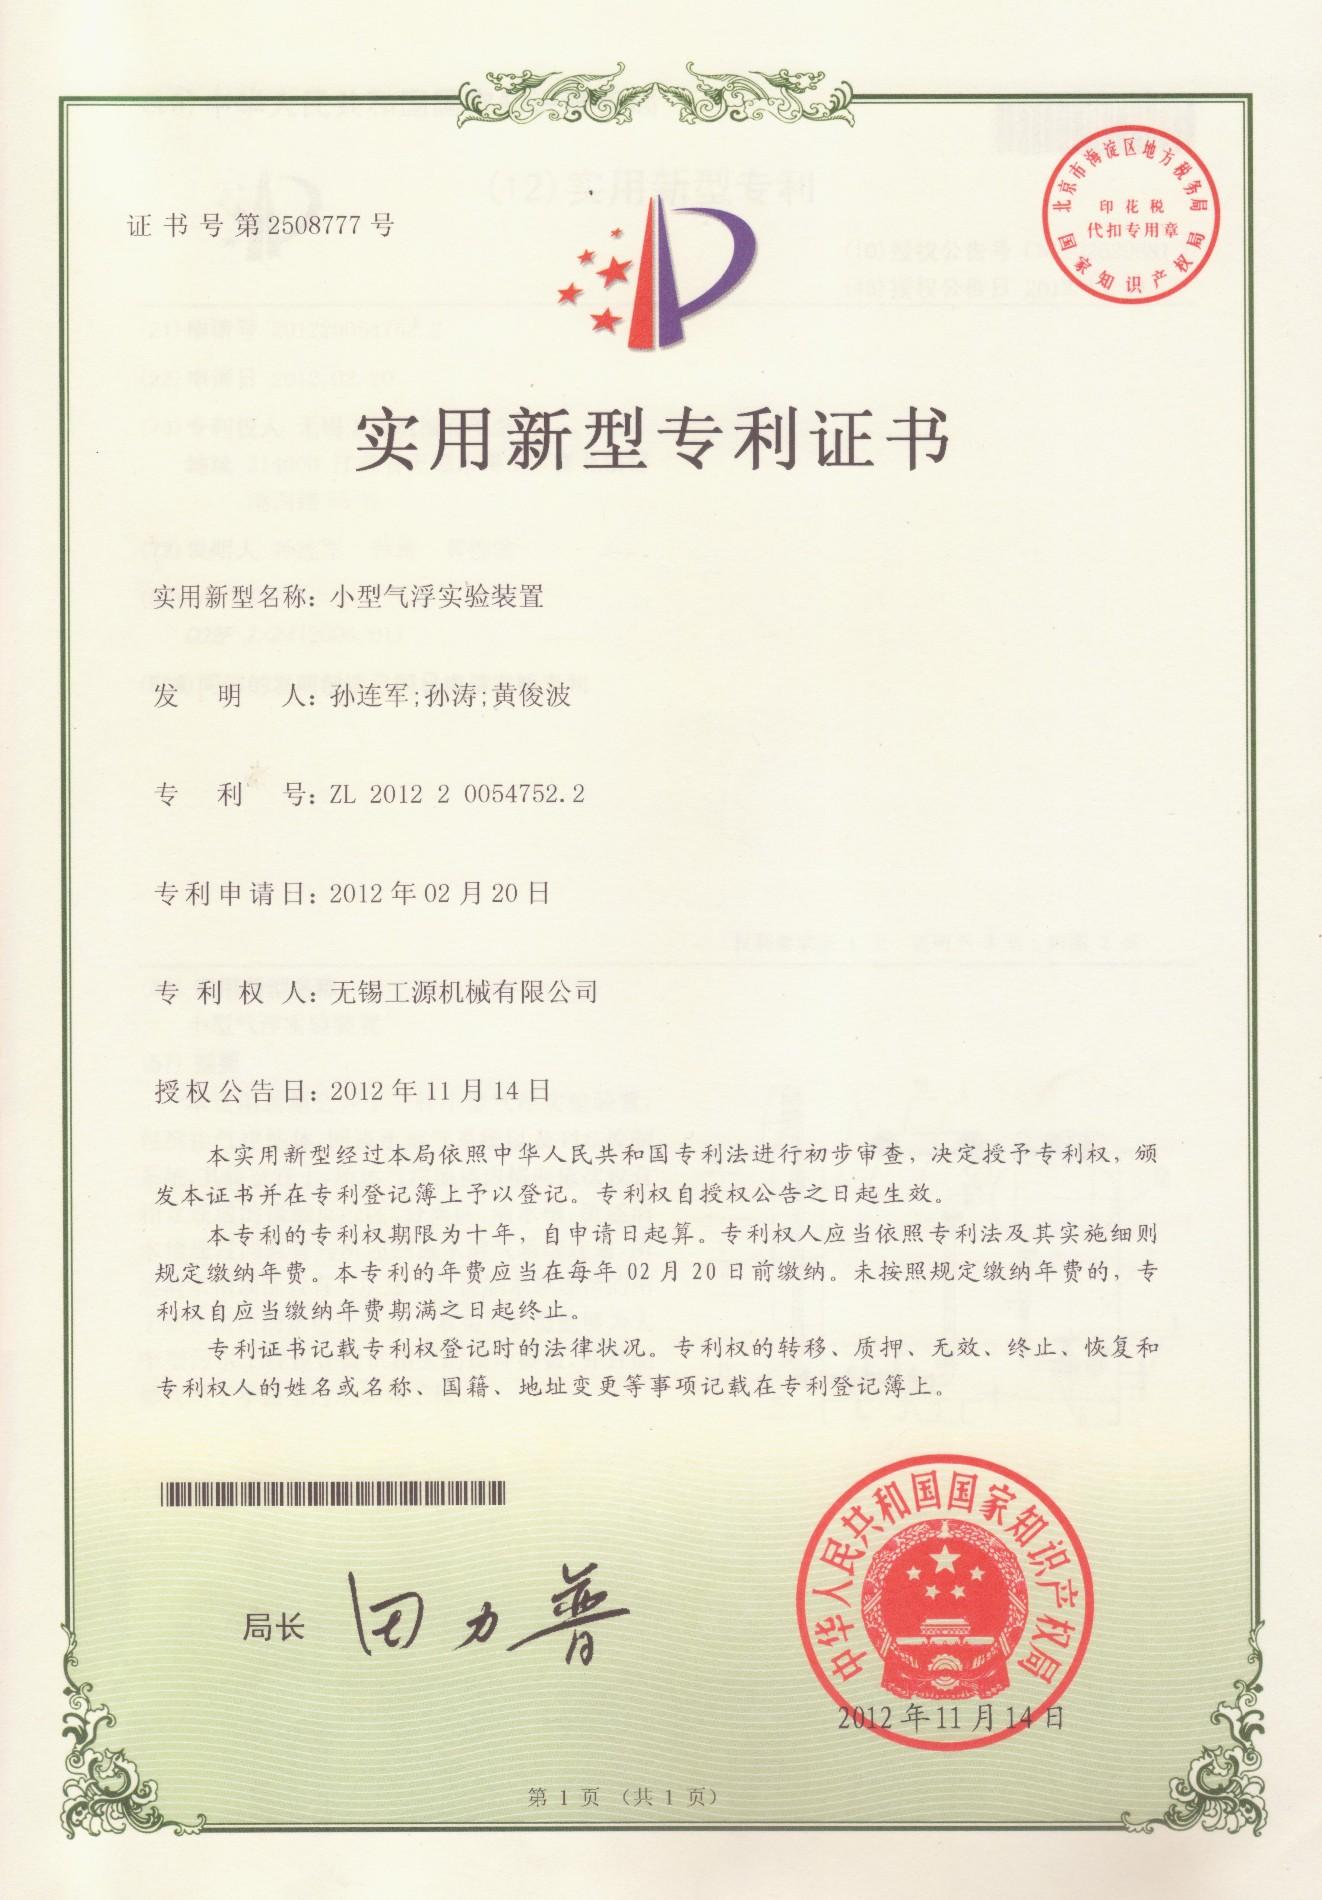 Experimental DAF patent